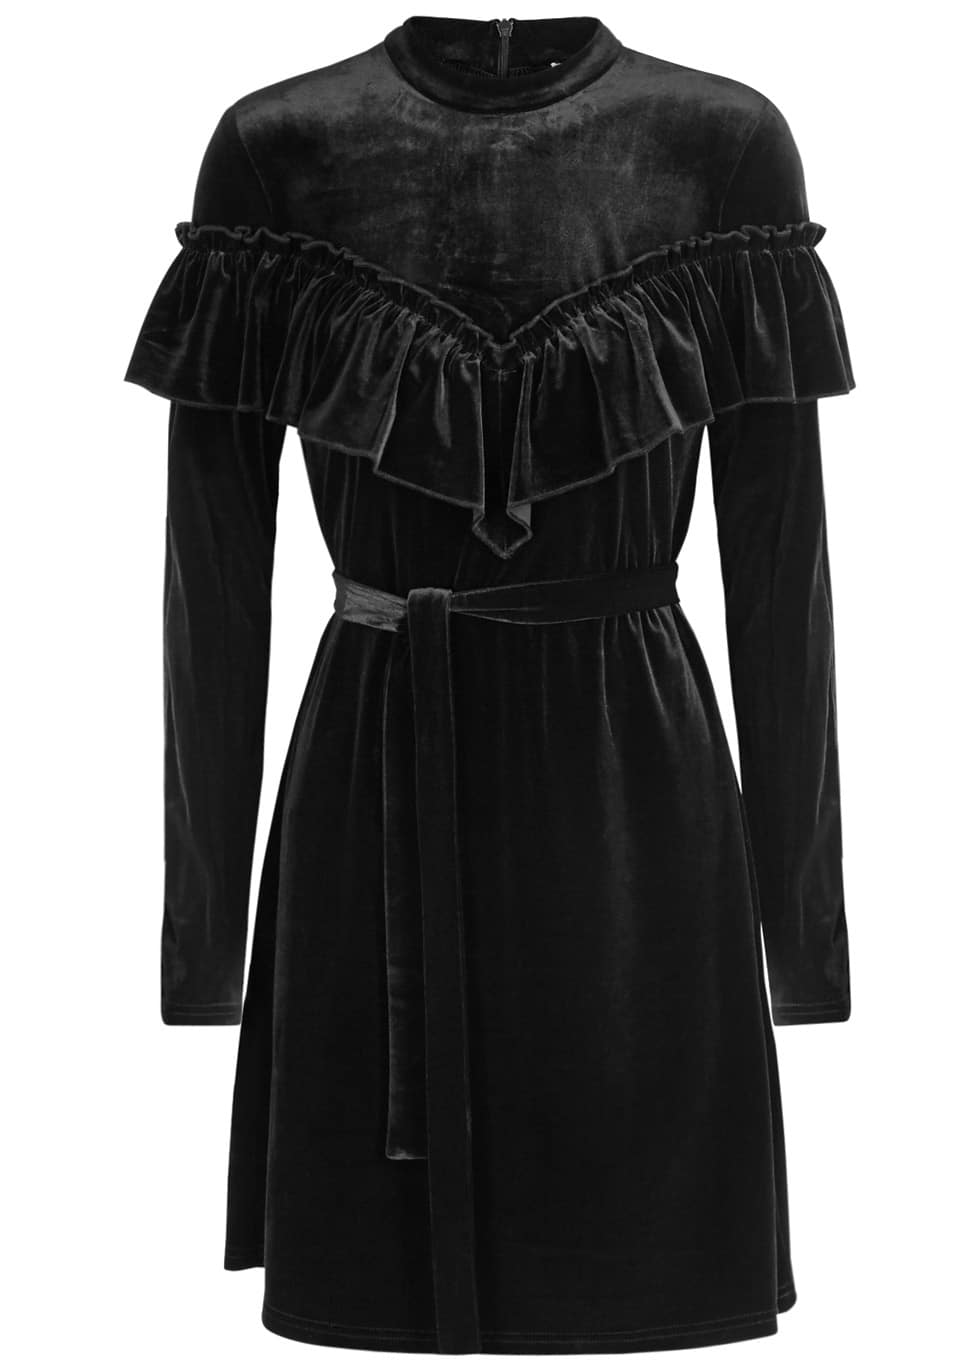 GESTUZ Locklyn Ruffle-Trimmed Velvet Black Dress